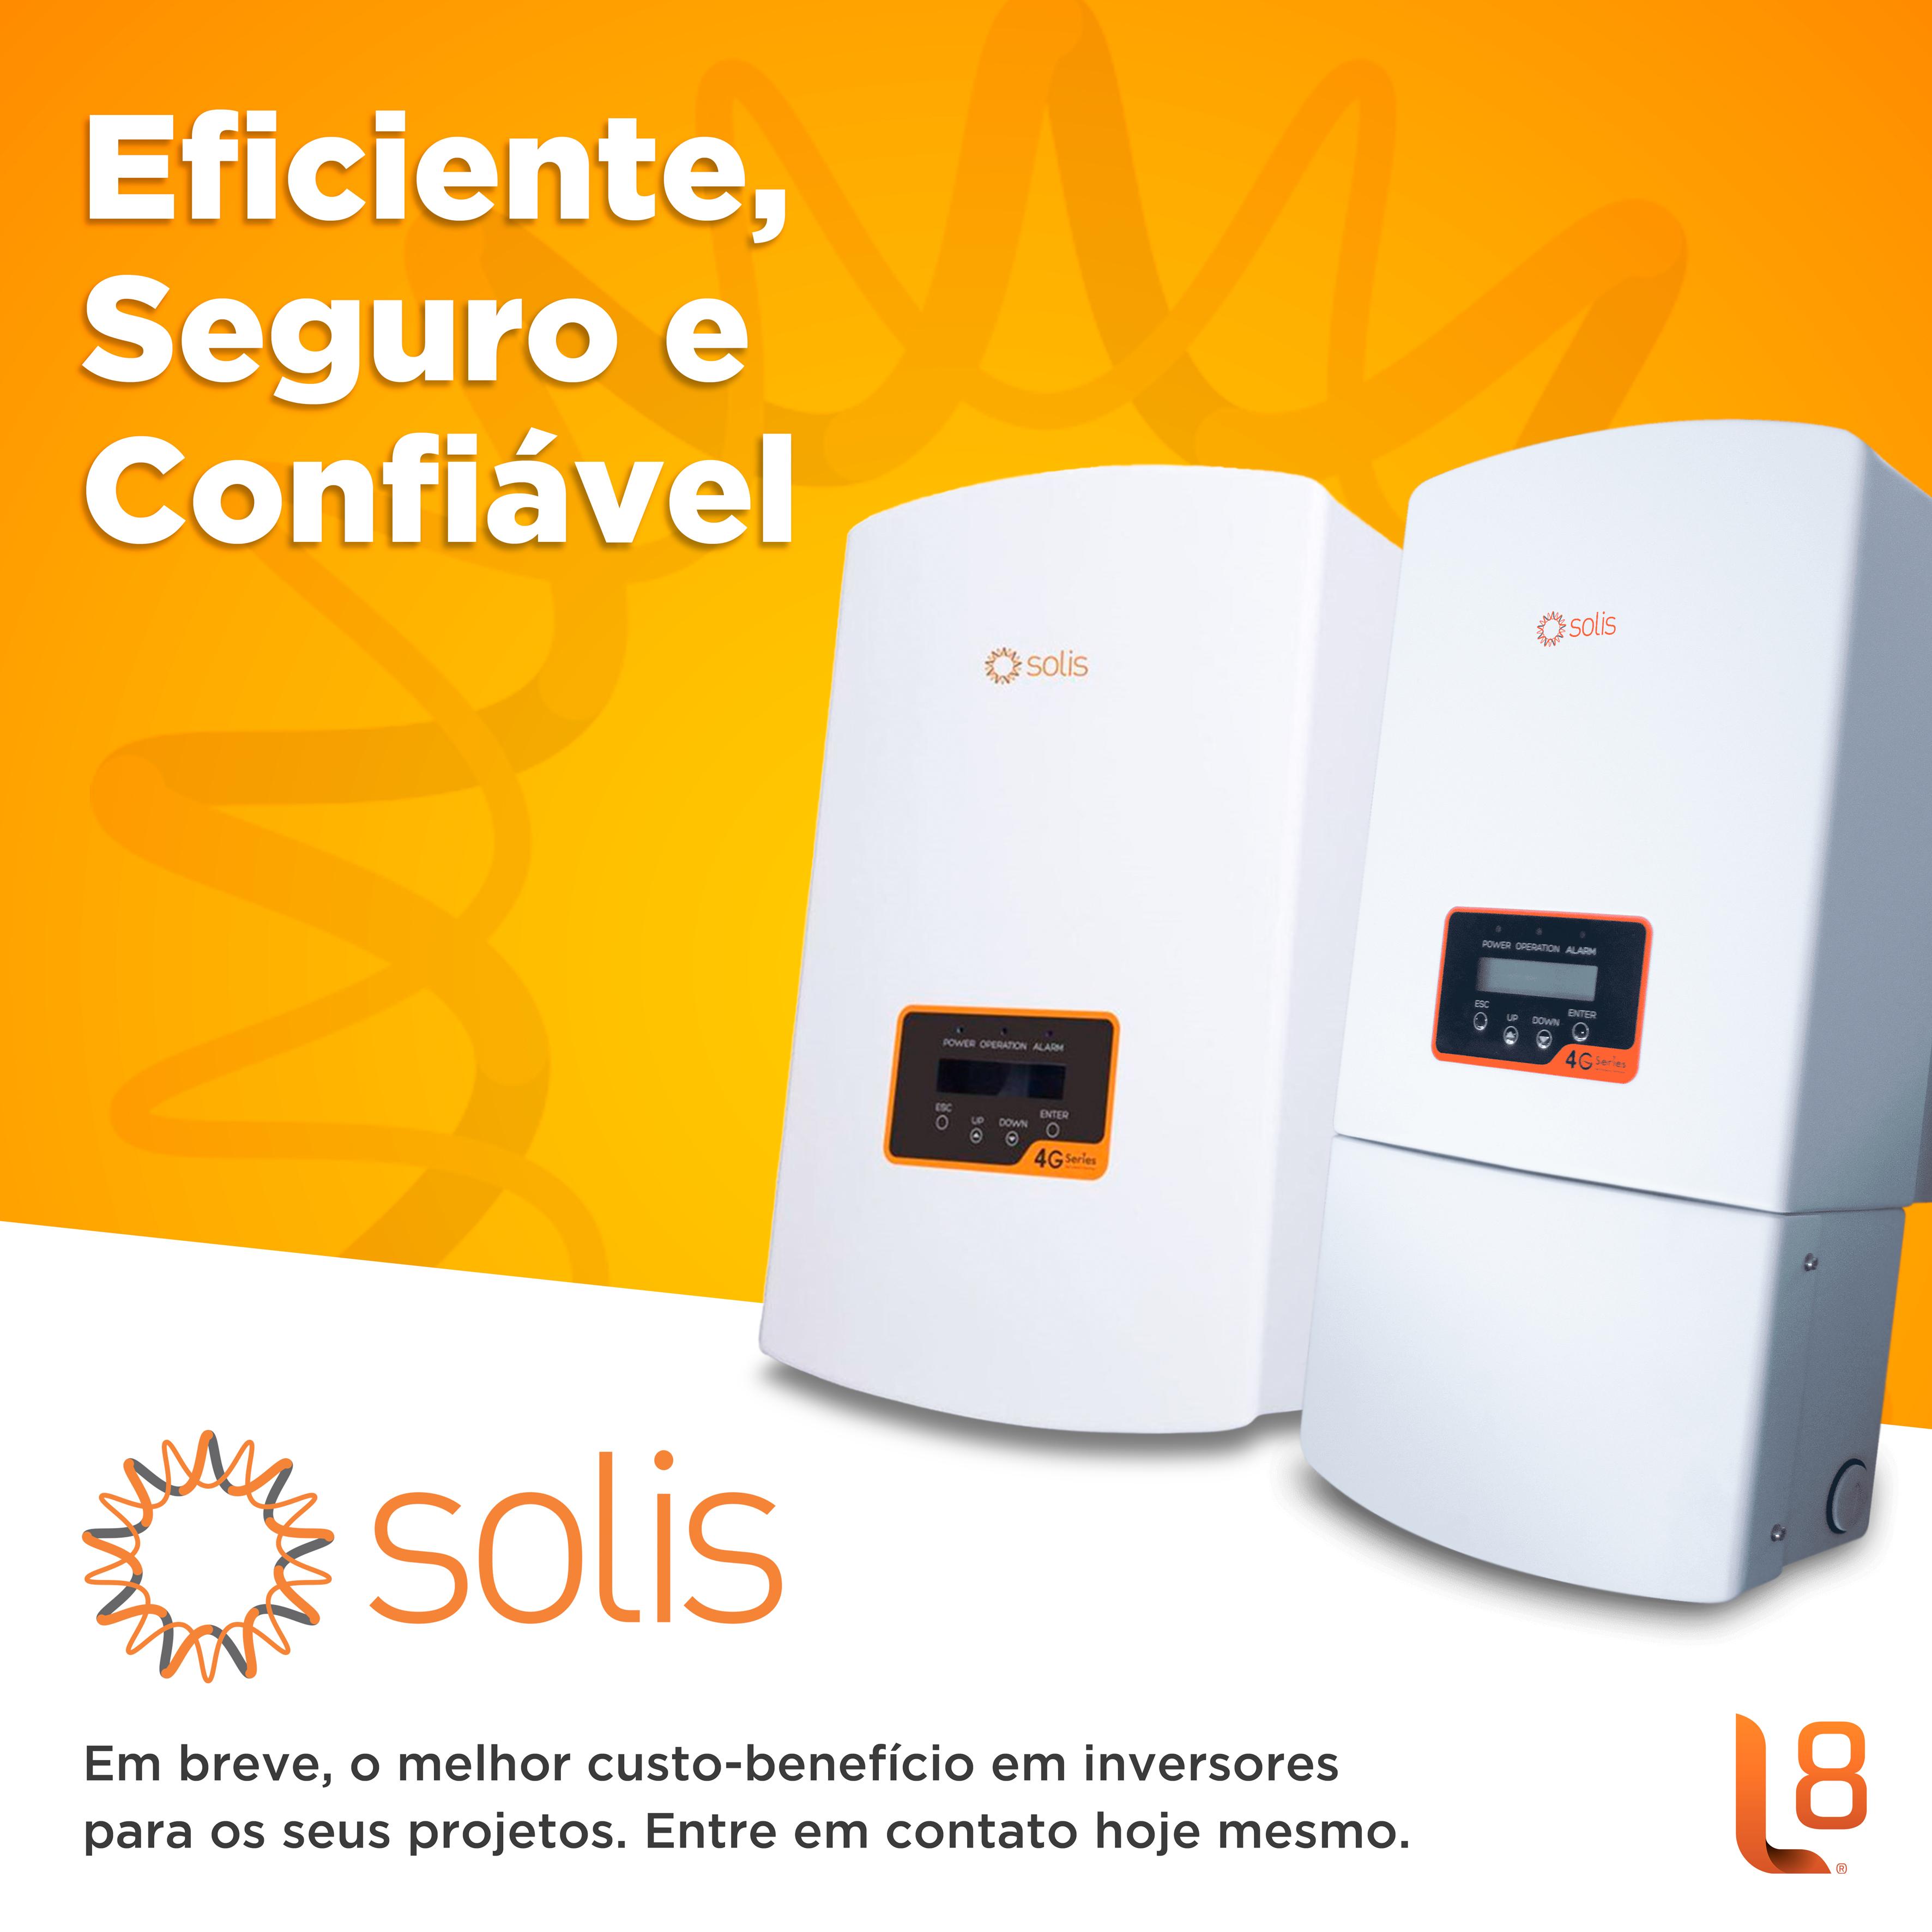 Inversor Solis – eficiente, seguro e confiável.